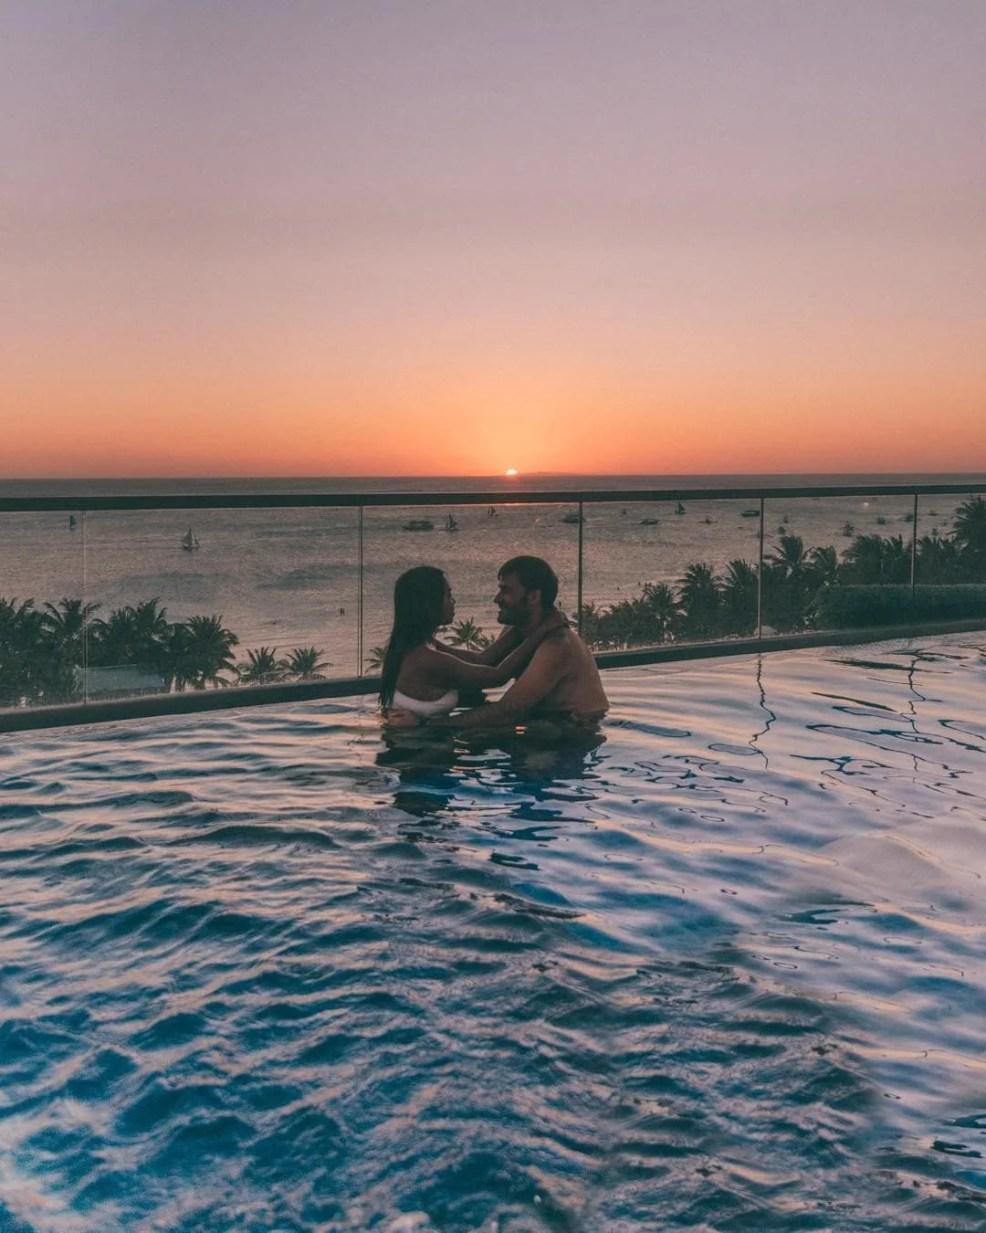 Things to do in Boracay Island, Boracay island travel guide, budget travel in boracay island, Boracay Island, Discovery shores Boracay, rooftop in Boracay